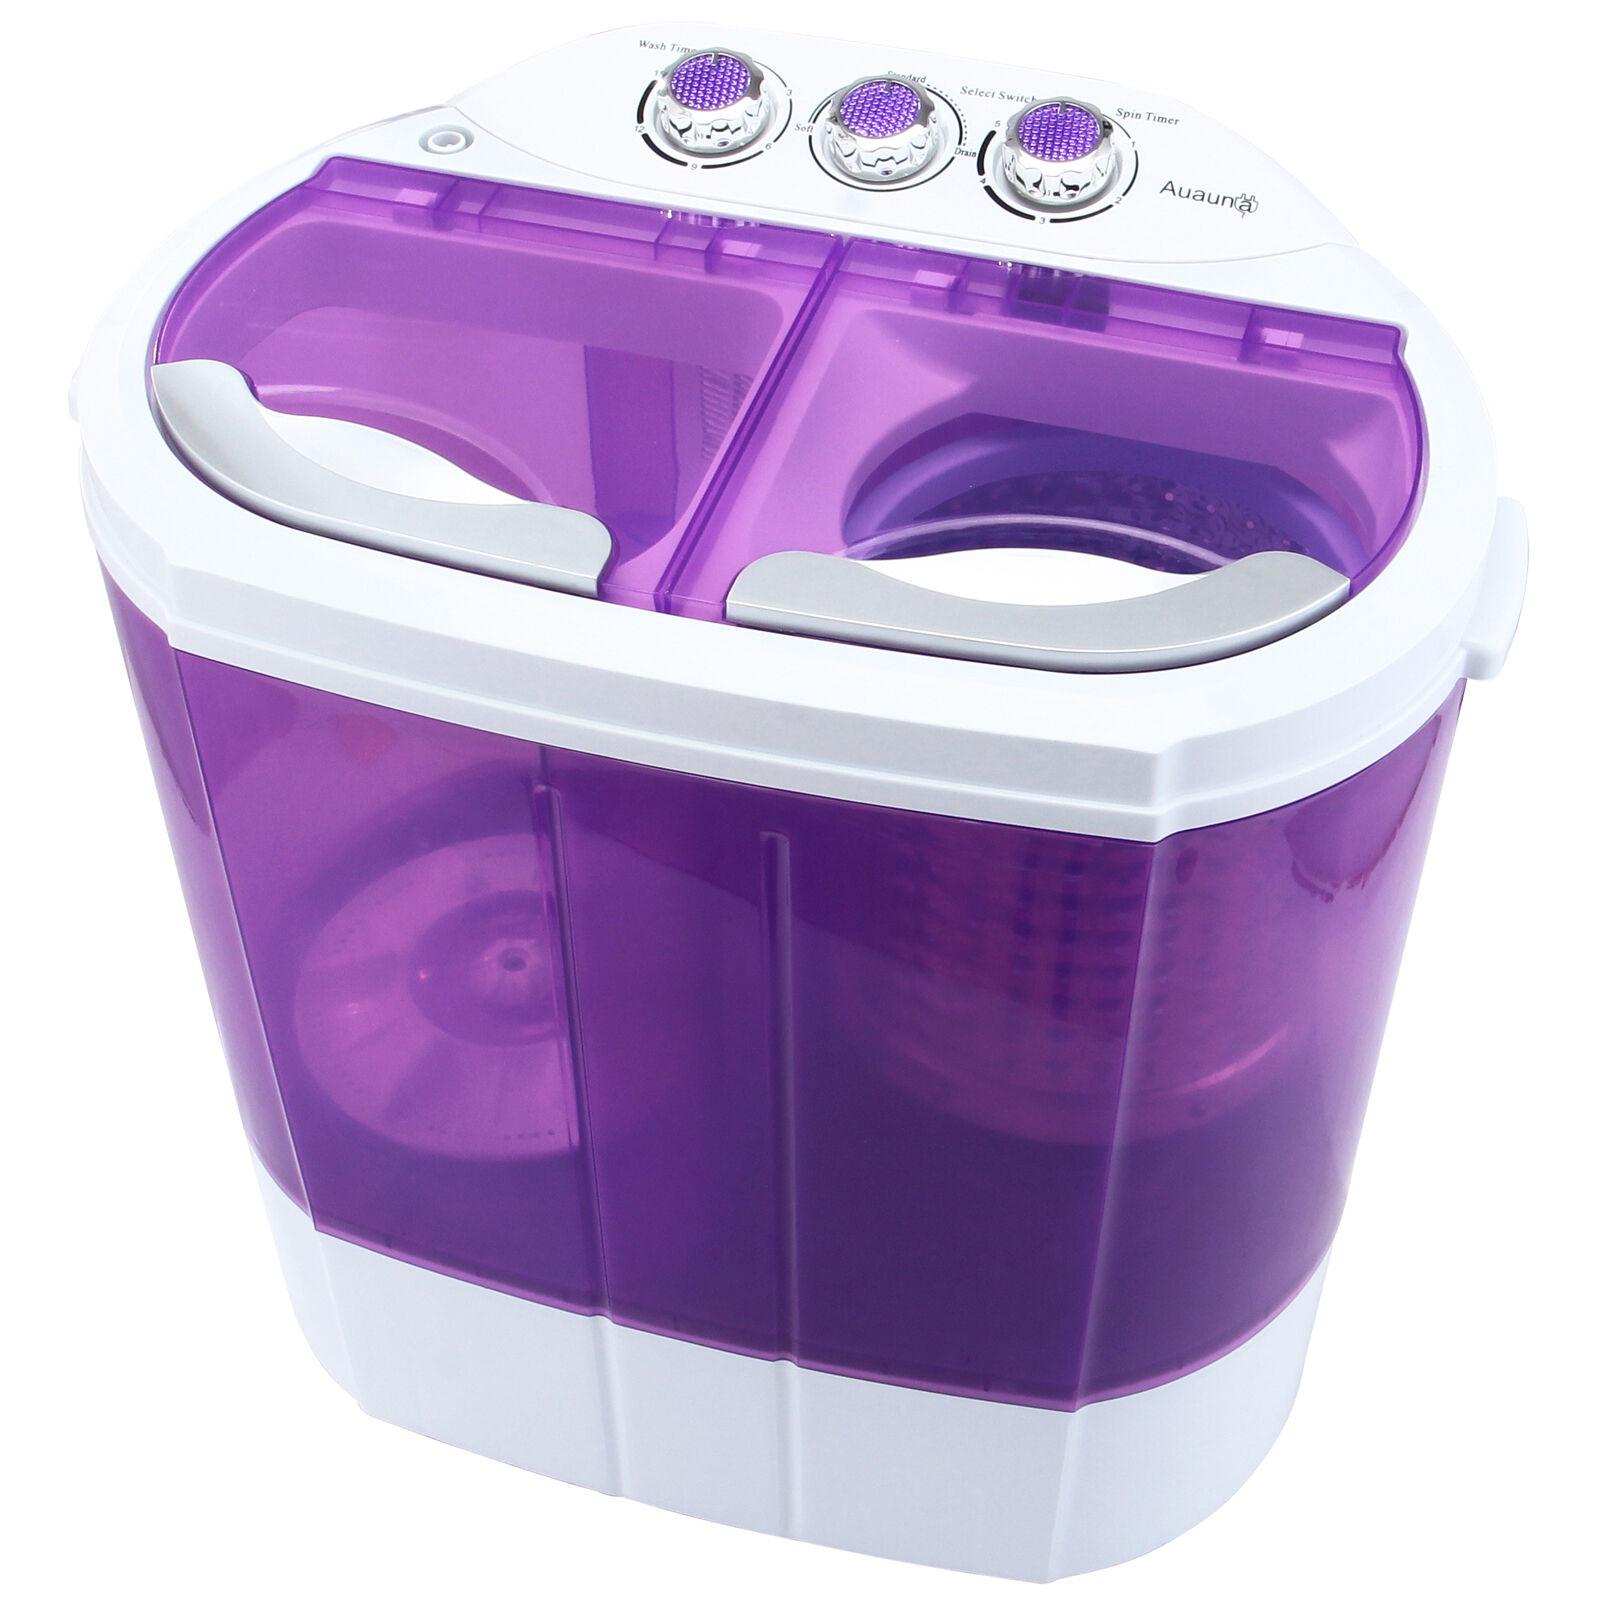 Mini Washing Machine ~ Mini lbs portable washing machine compact washer spin